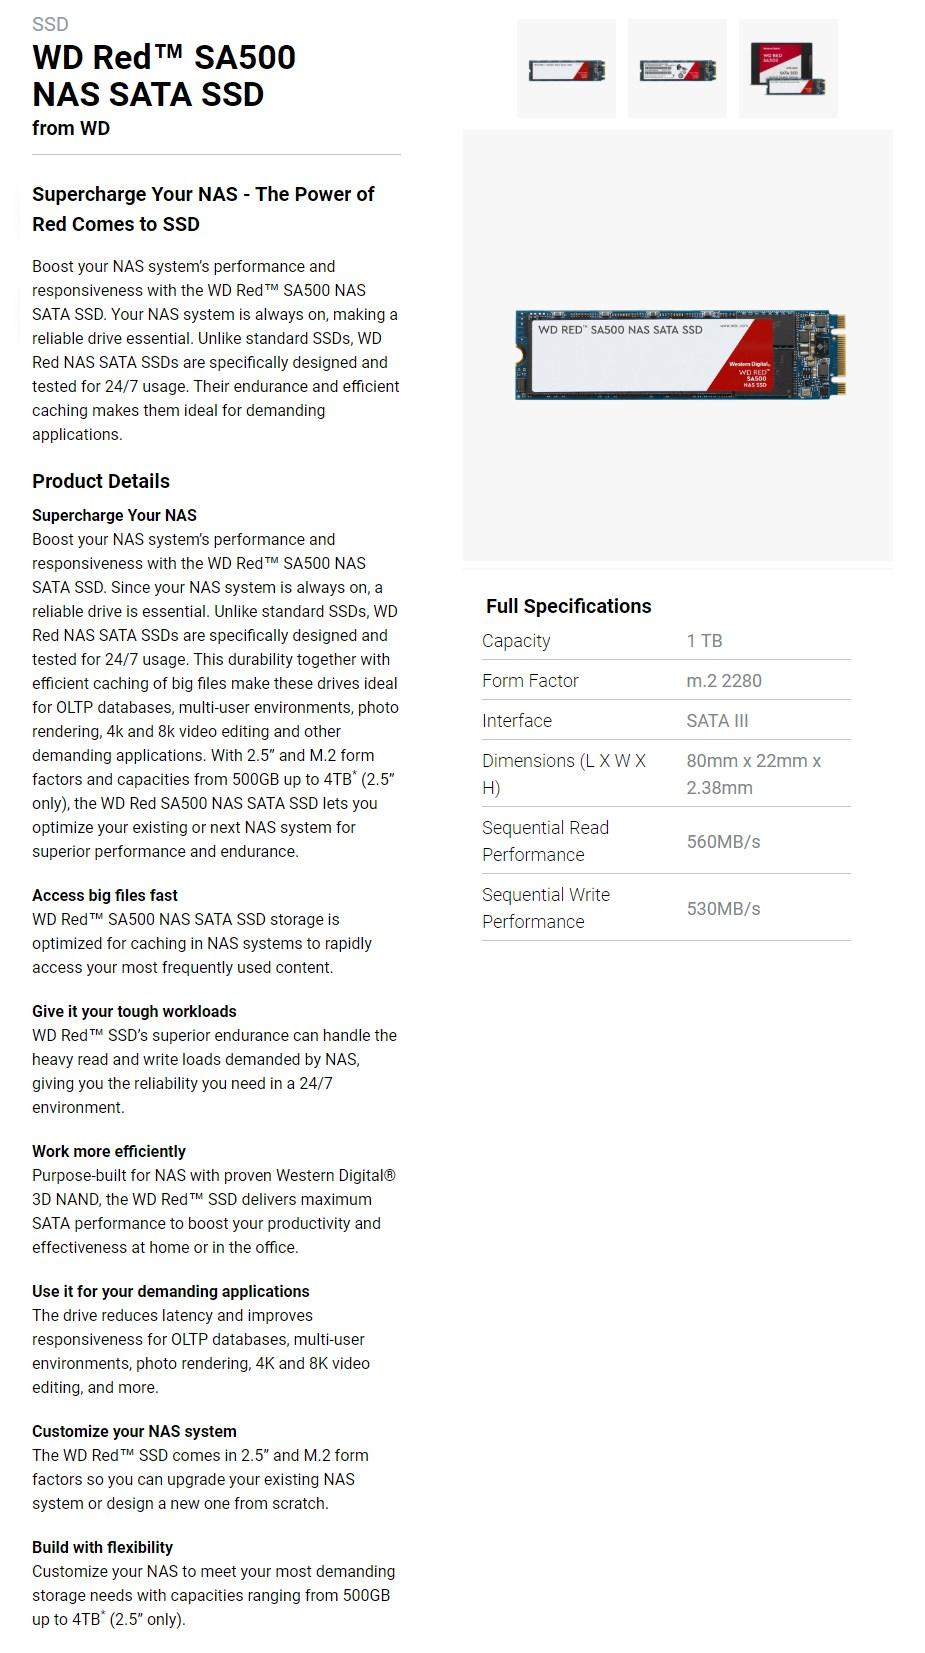 WD Red 1TB m.2 2280 SA500 NAS SATA SSD WDS100T1R0B - Overview 1